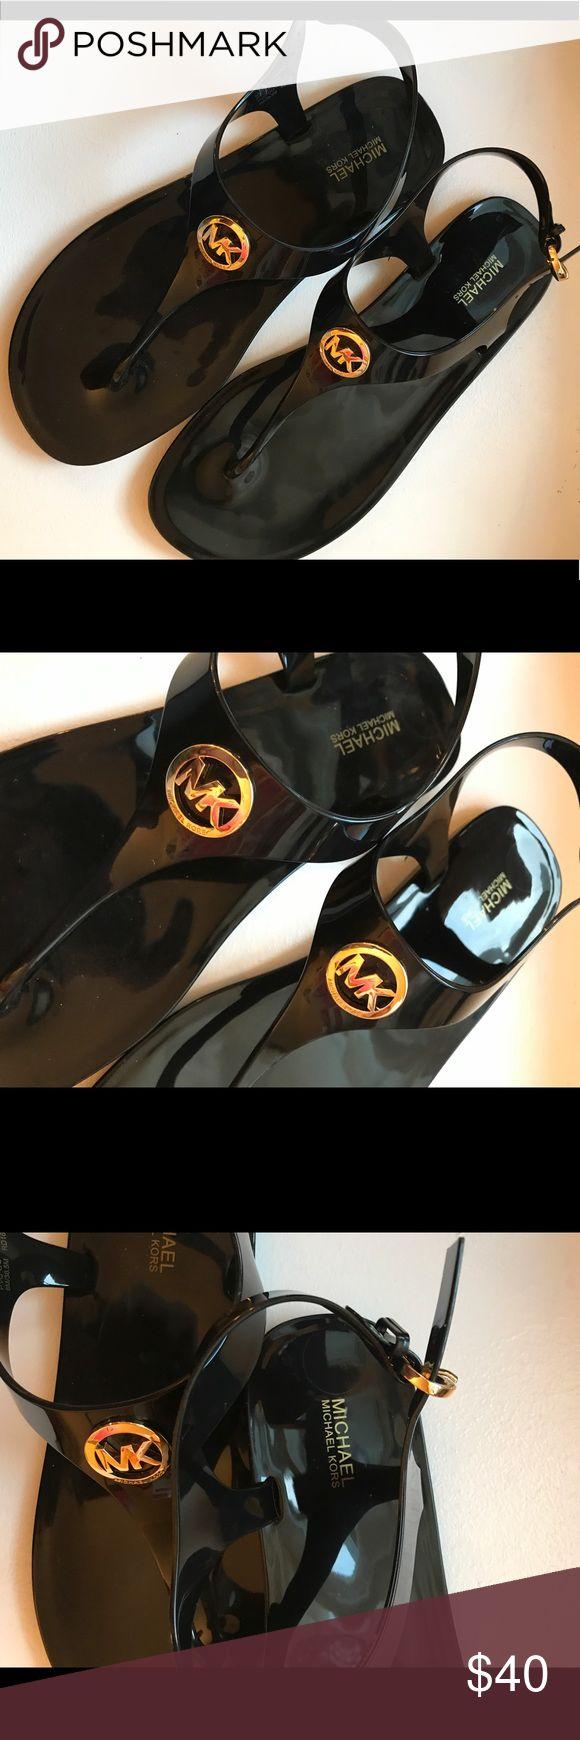 Michael Kors Logo Black Jelly T Strap Flats NEW Michael Kors Logo Black Jelly T Strap Flats NEW no box. MK Sondra Sandal. Michael Kors Shoes Sandals